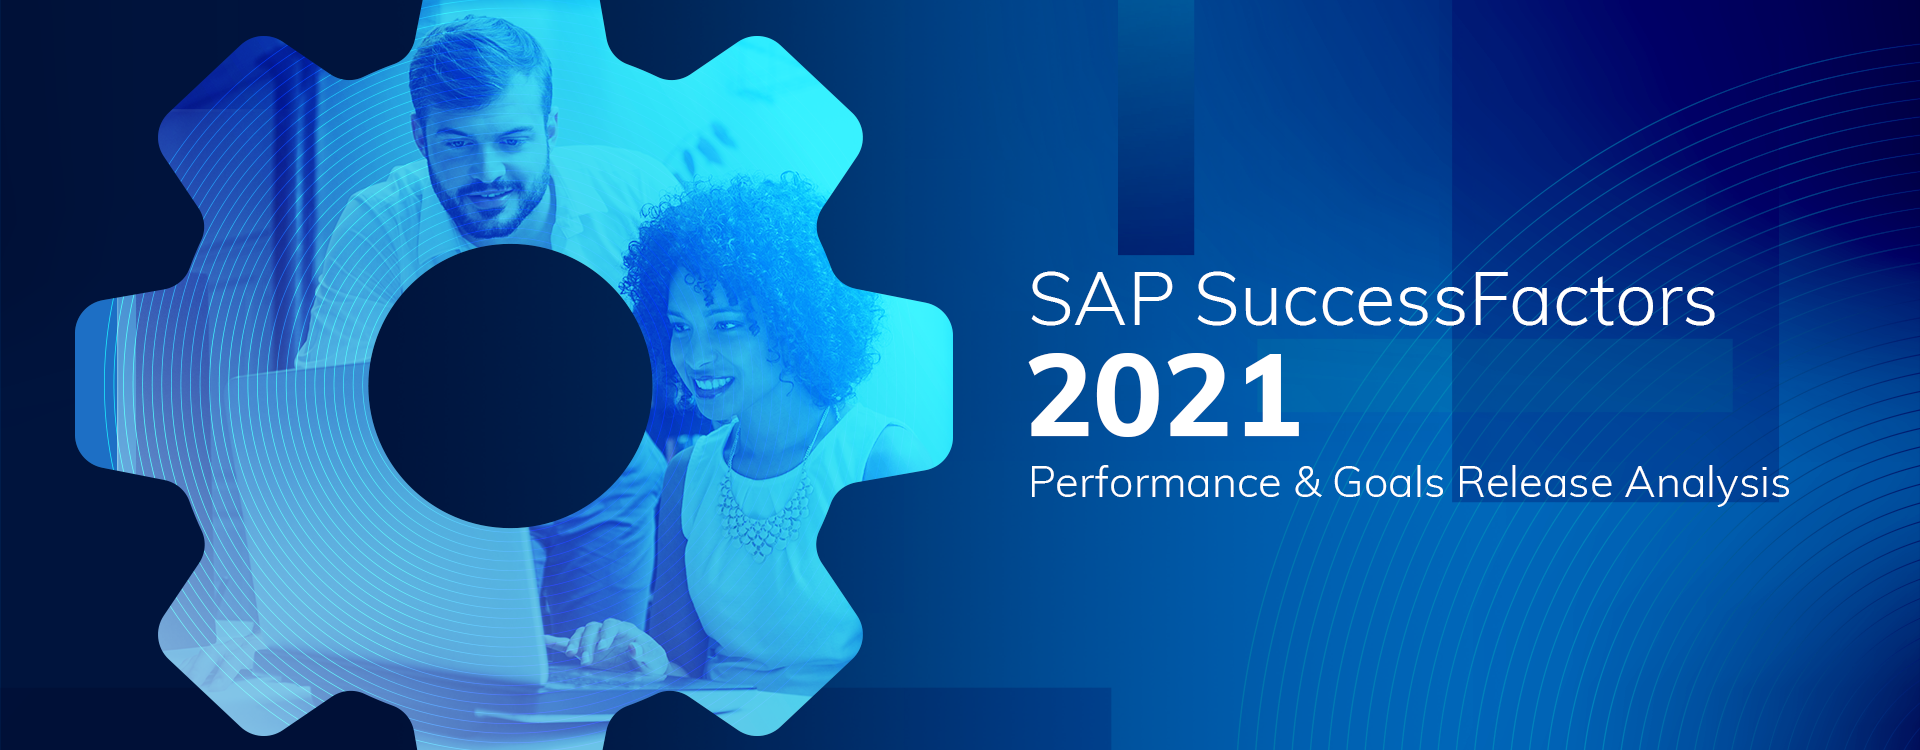 SAP SuccessFactors H1 2021 Performance & Goals Release Analysis featured image